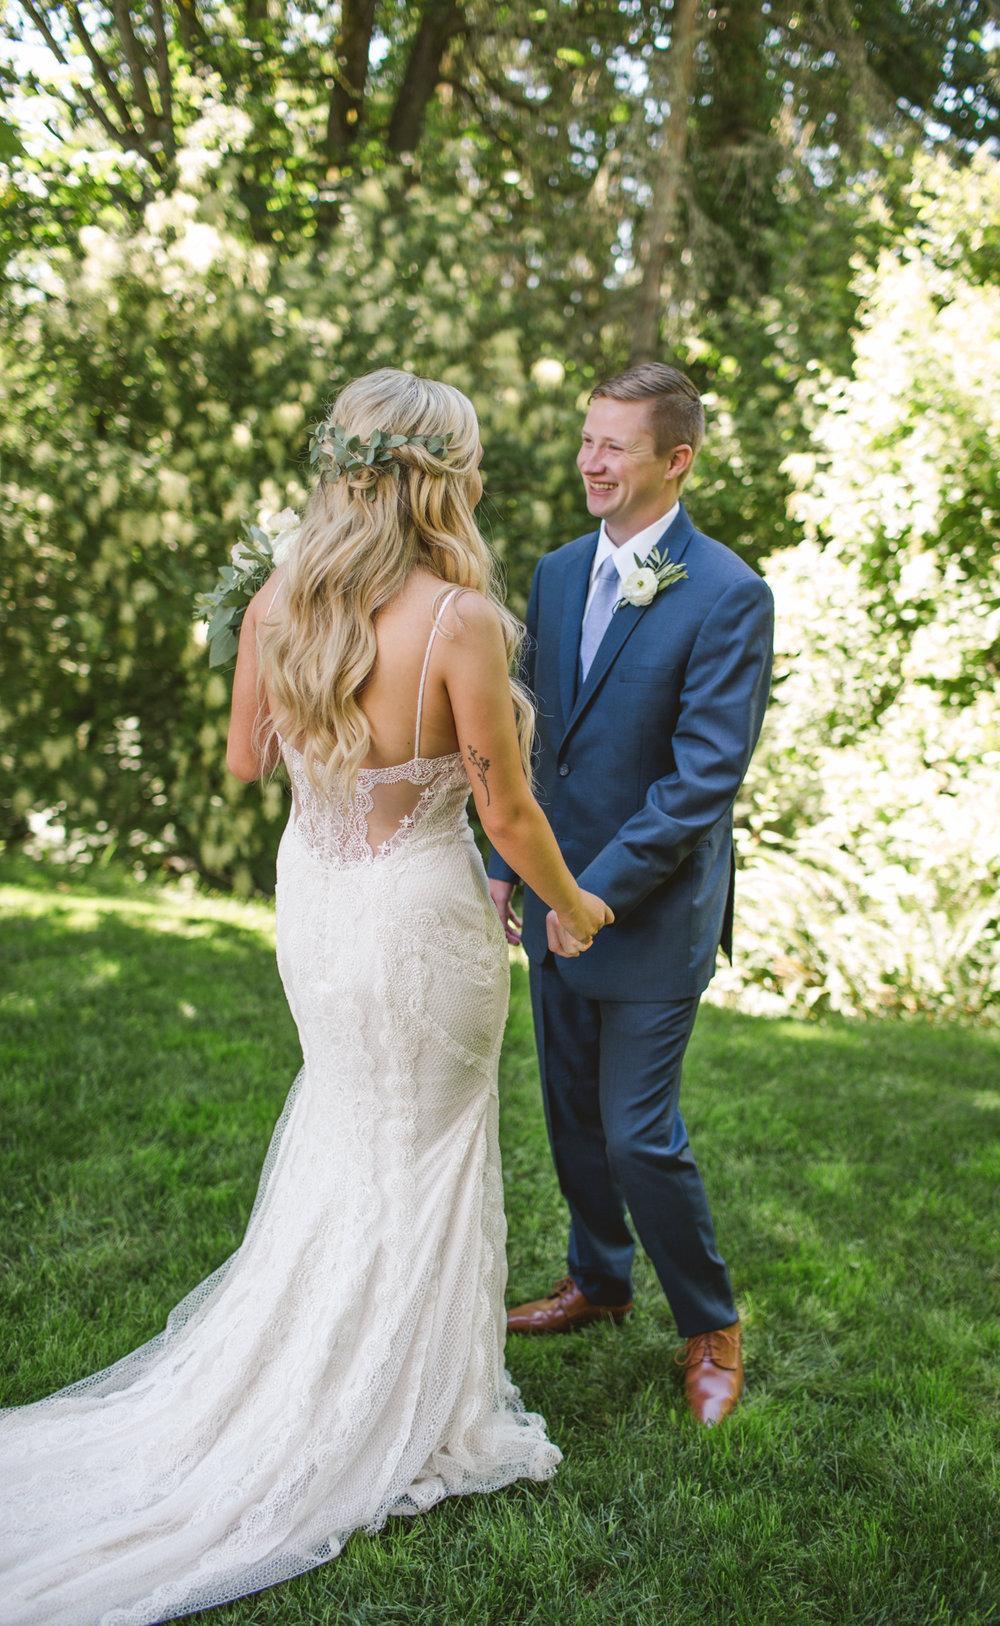 Bryanna & Rhy's Wedding-33.jpg